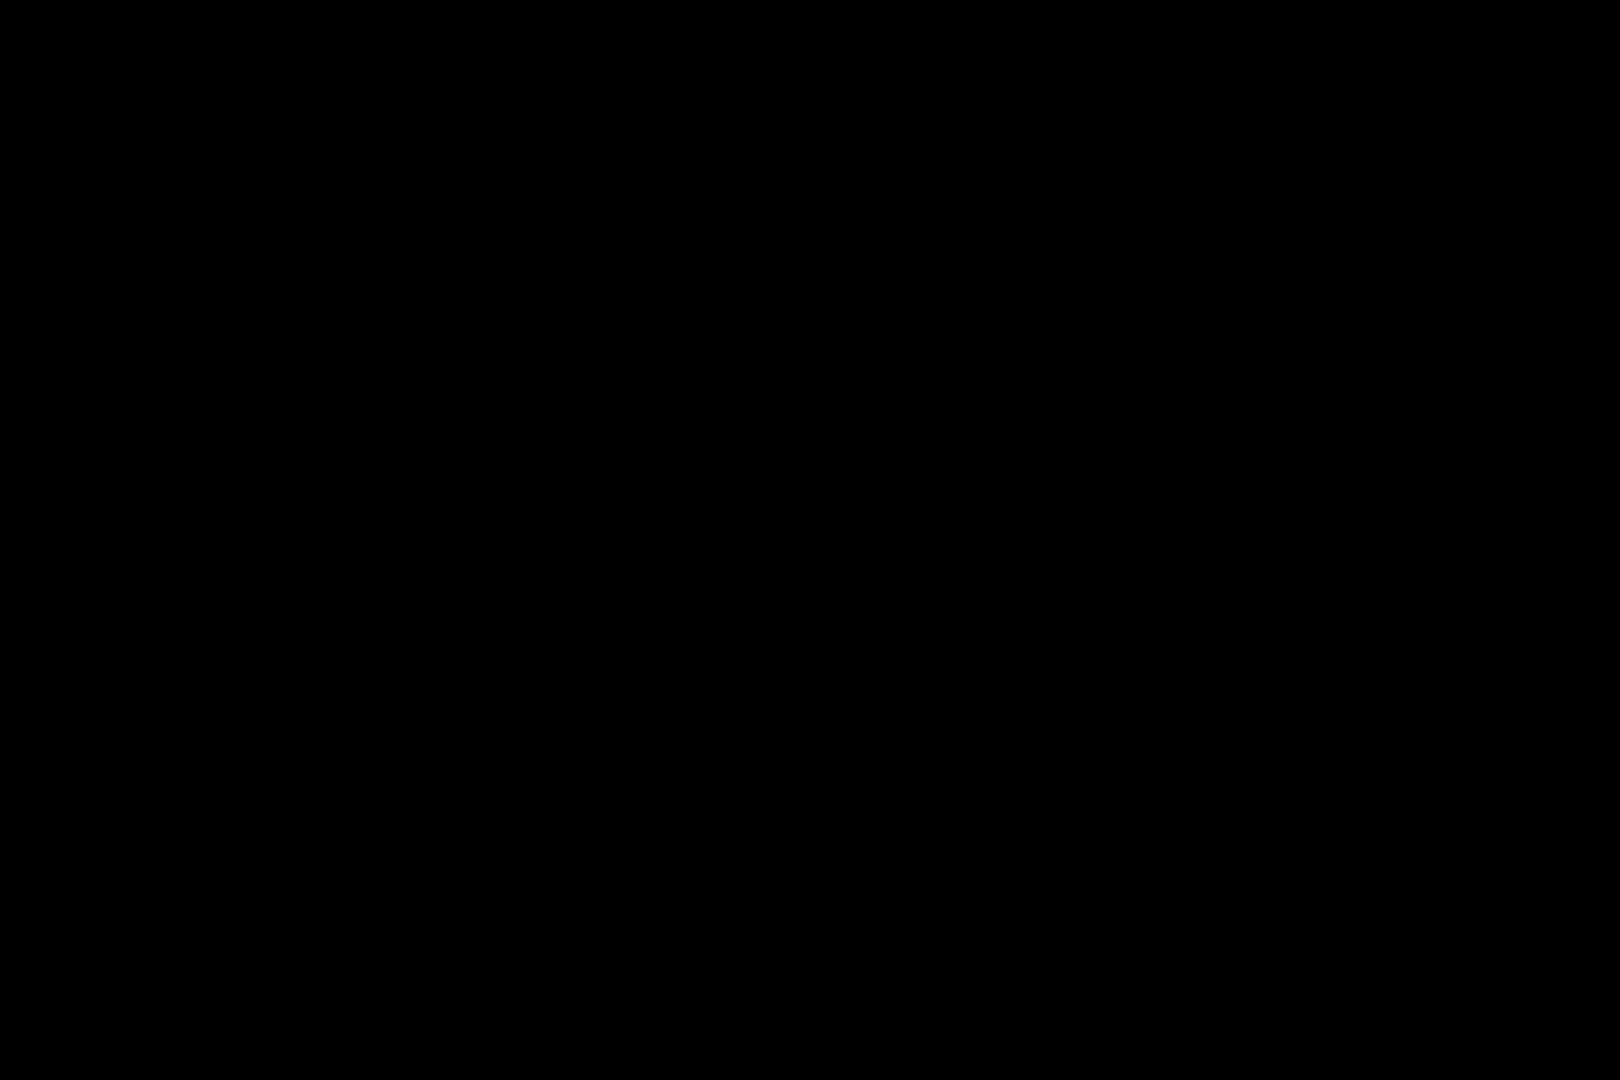 充血監督の深夜の運動会Vol.135 赤外線  22PICs 18